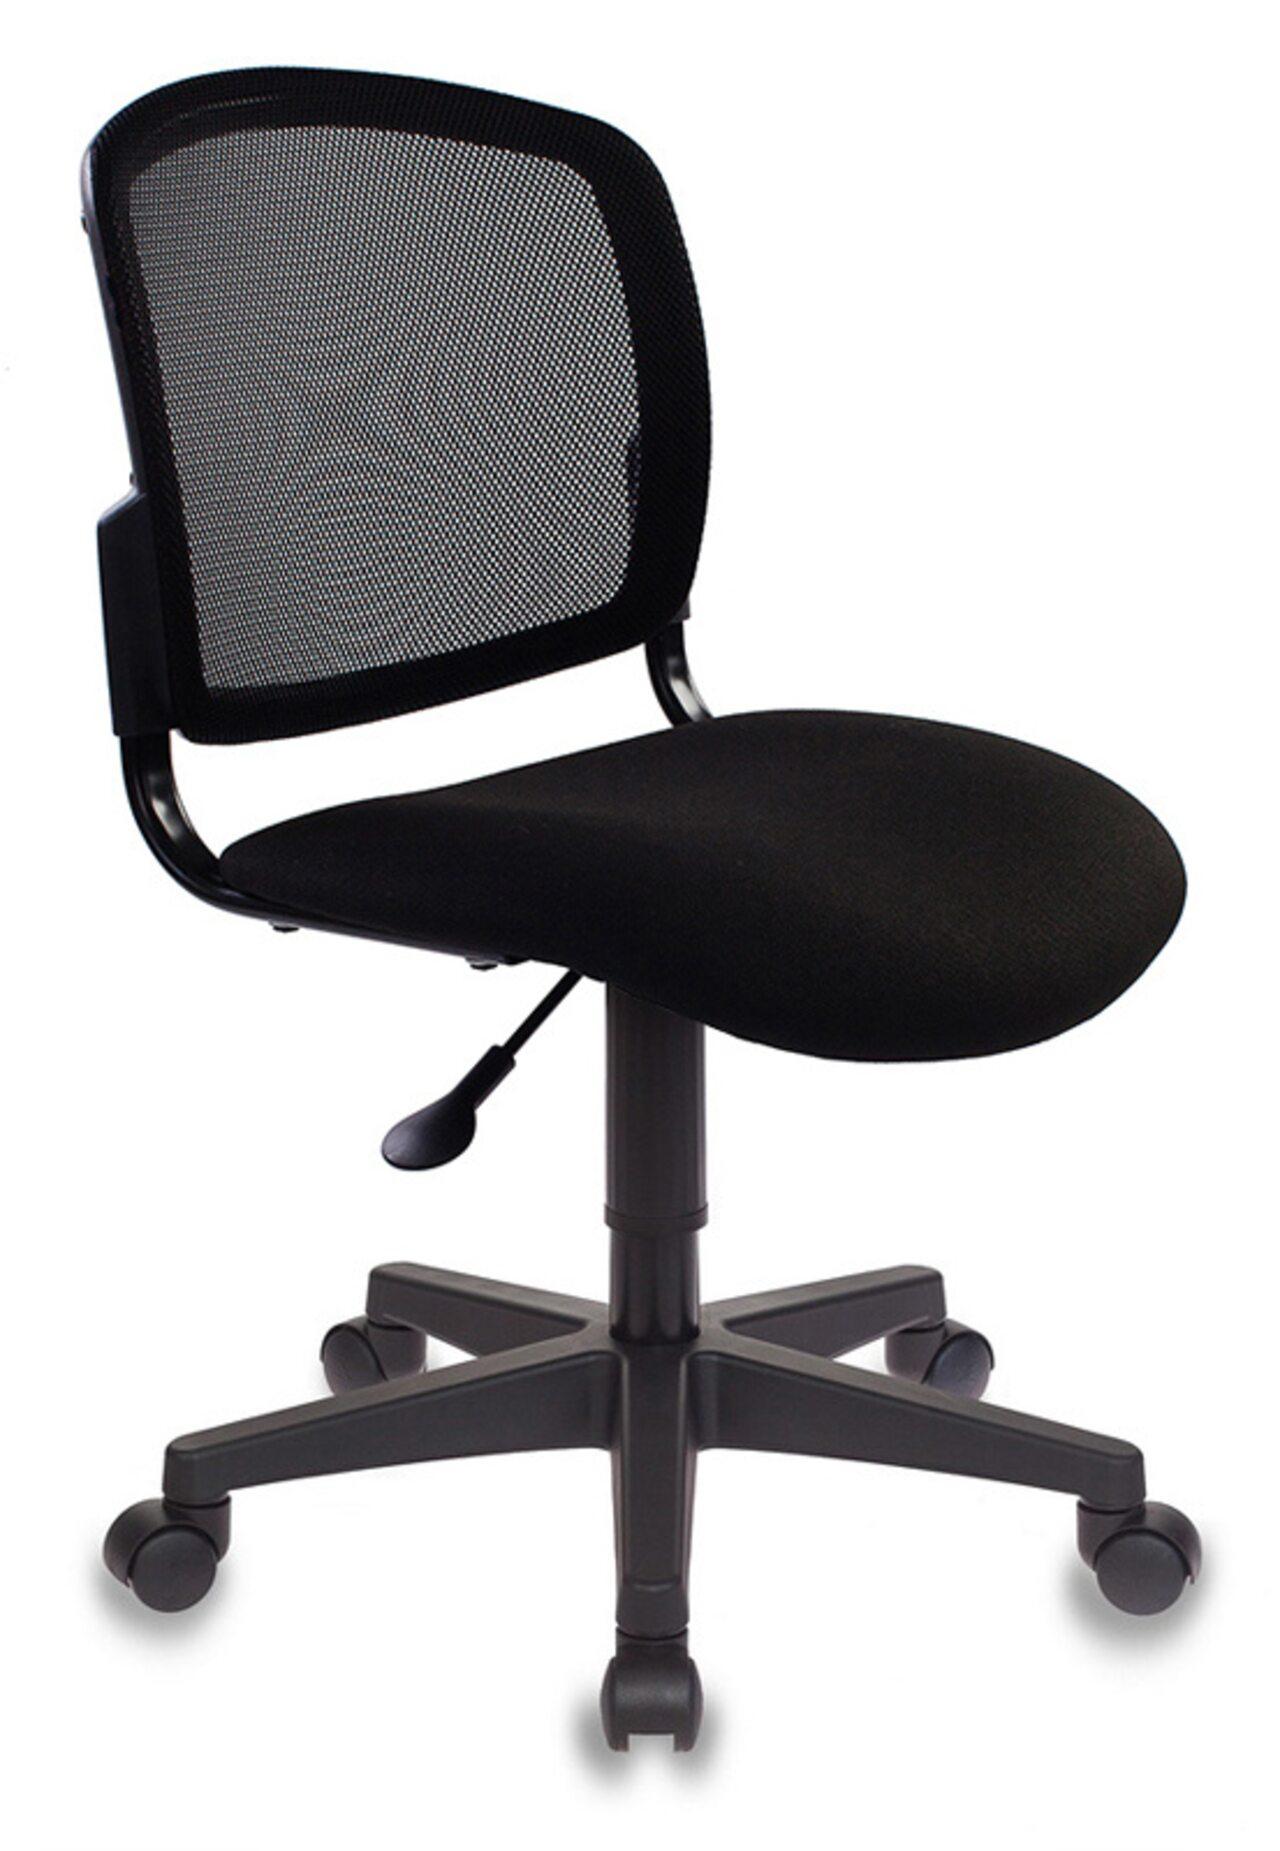 Кресло для персонала CH-296/BL/15-10 - фото 10